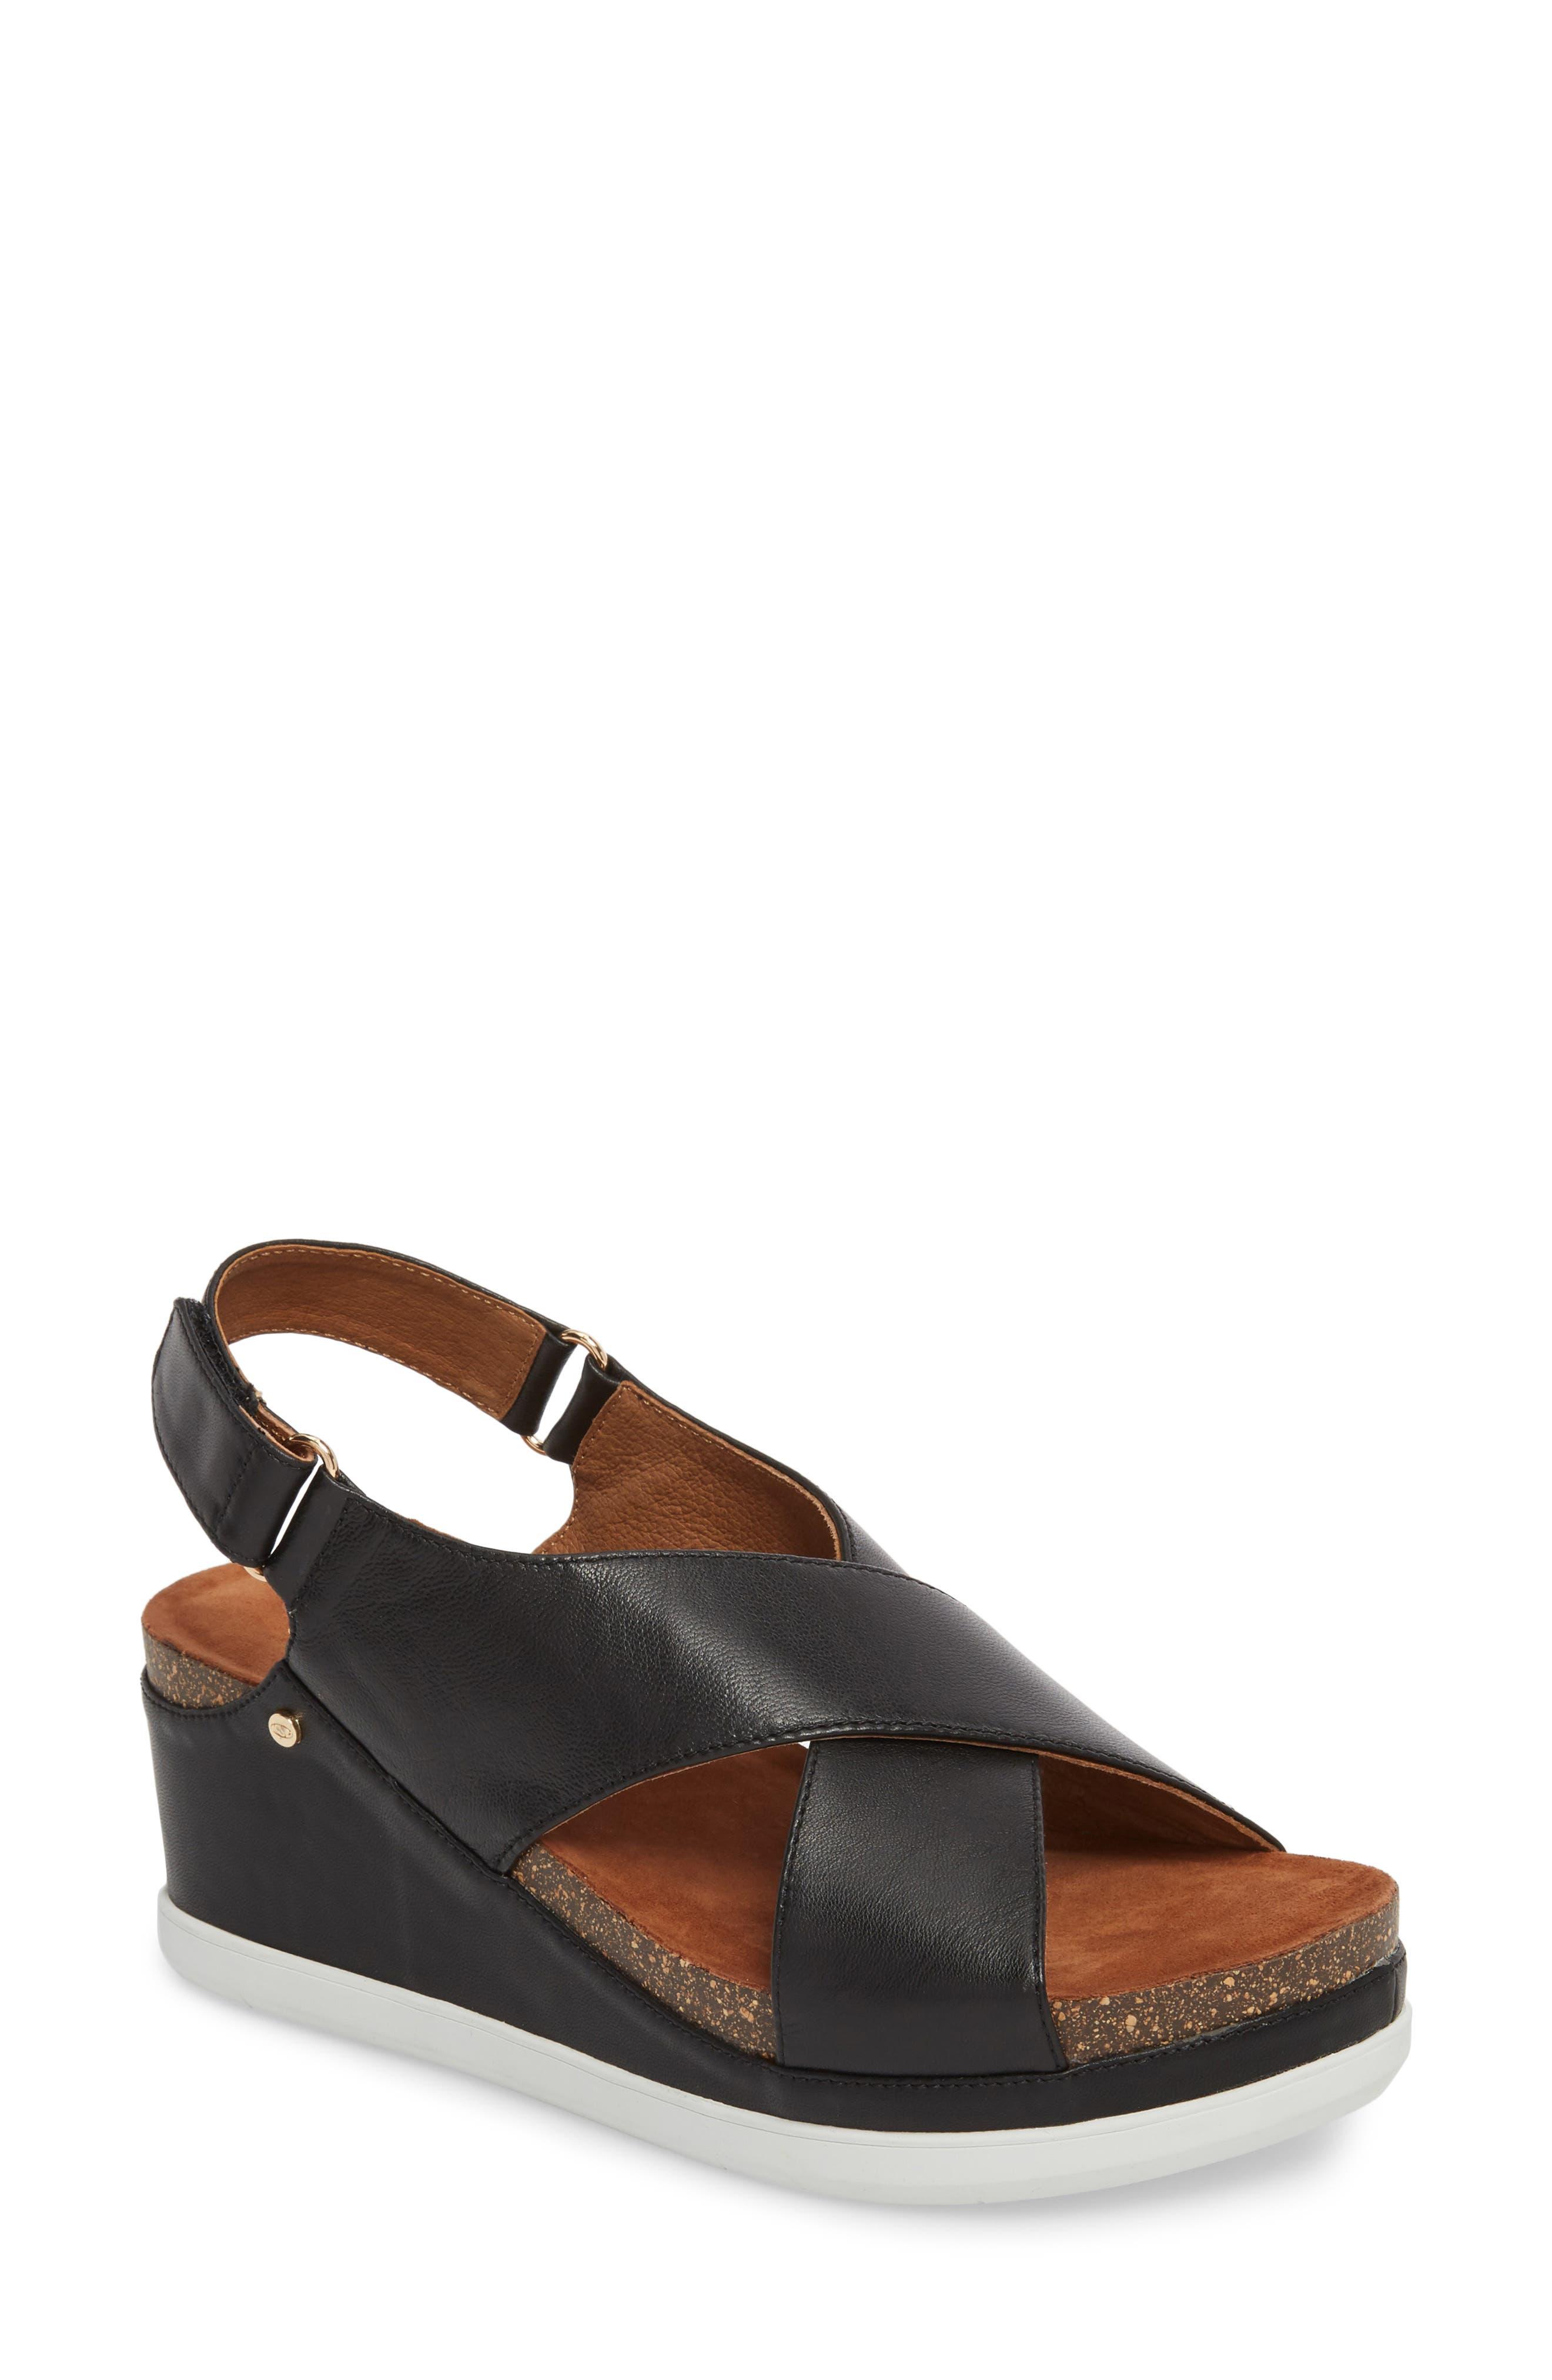 Sudini Pamela Slingback Wedge Sandal W - Black